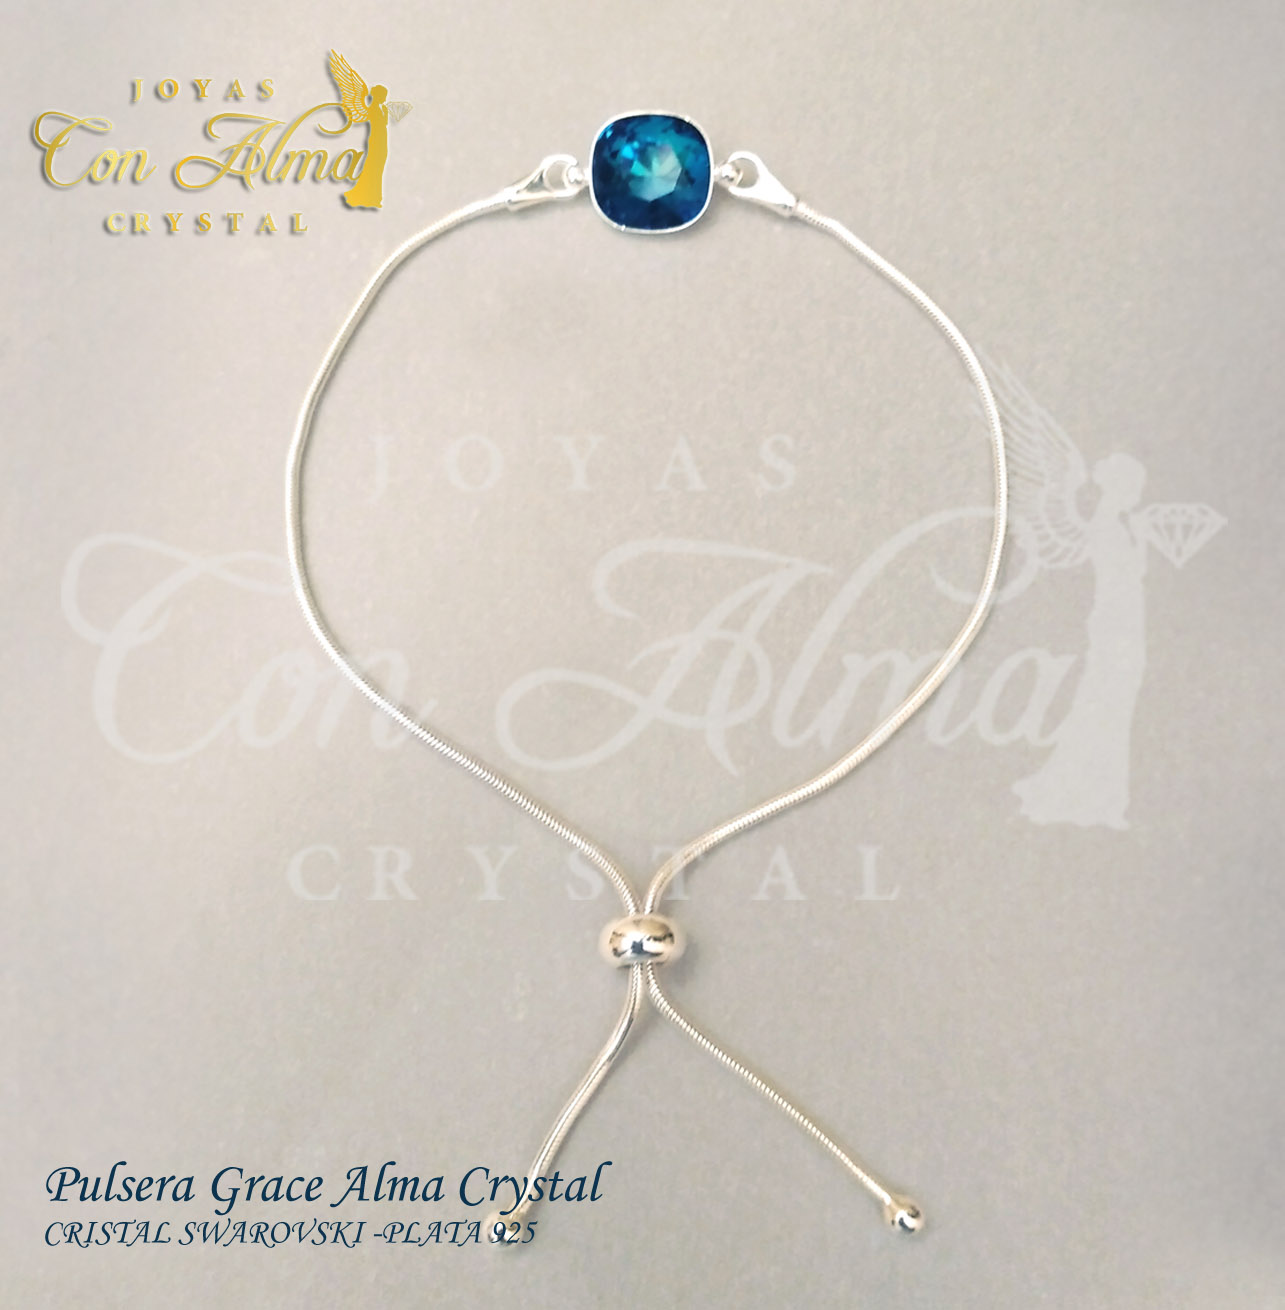 Pulsera Grace Alma Crystal  27 €